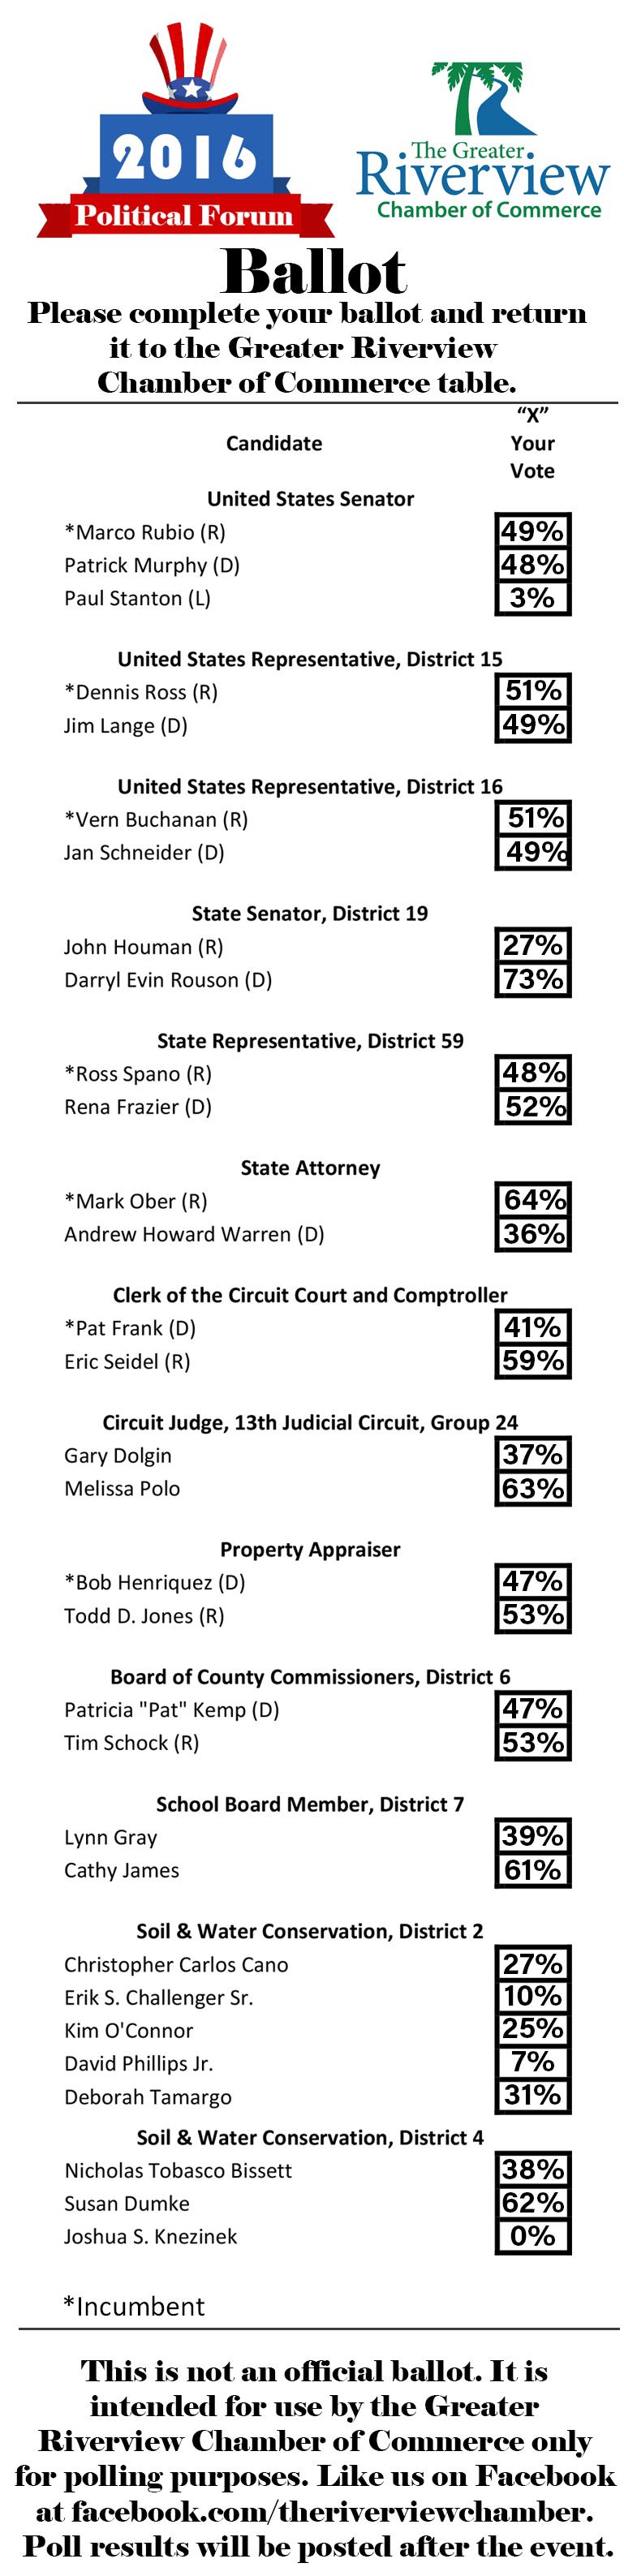 GRCC-ballot-results.jpg